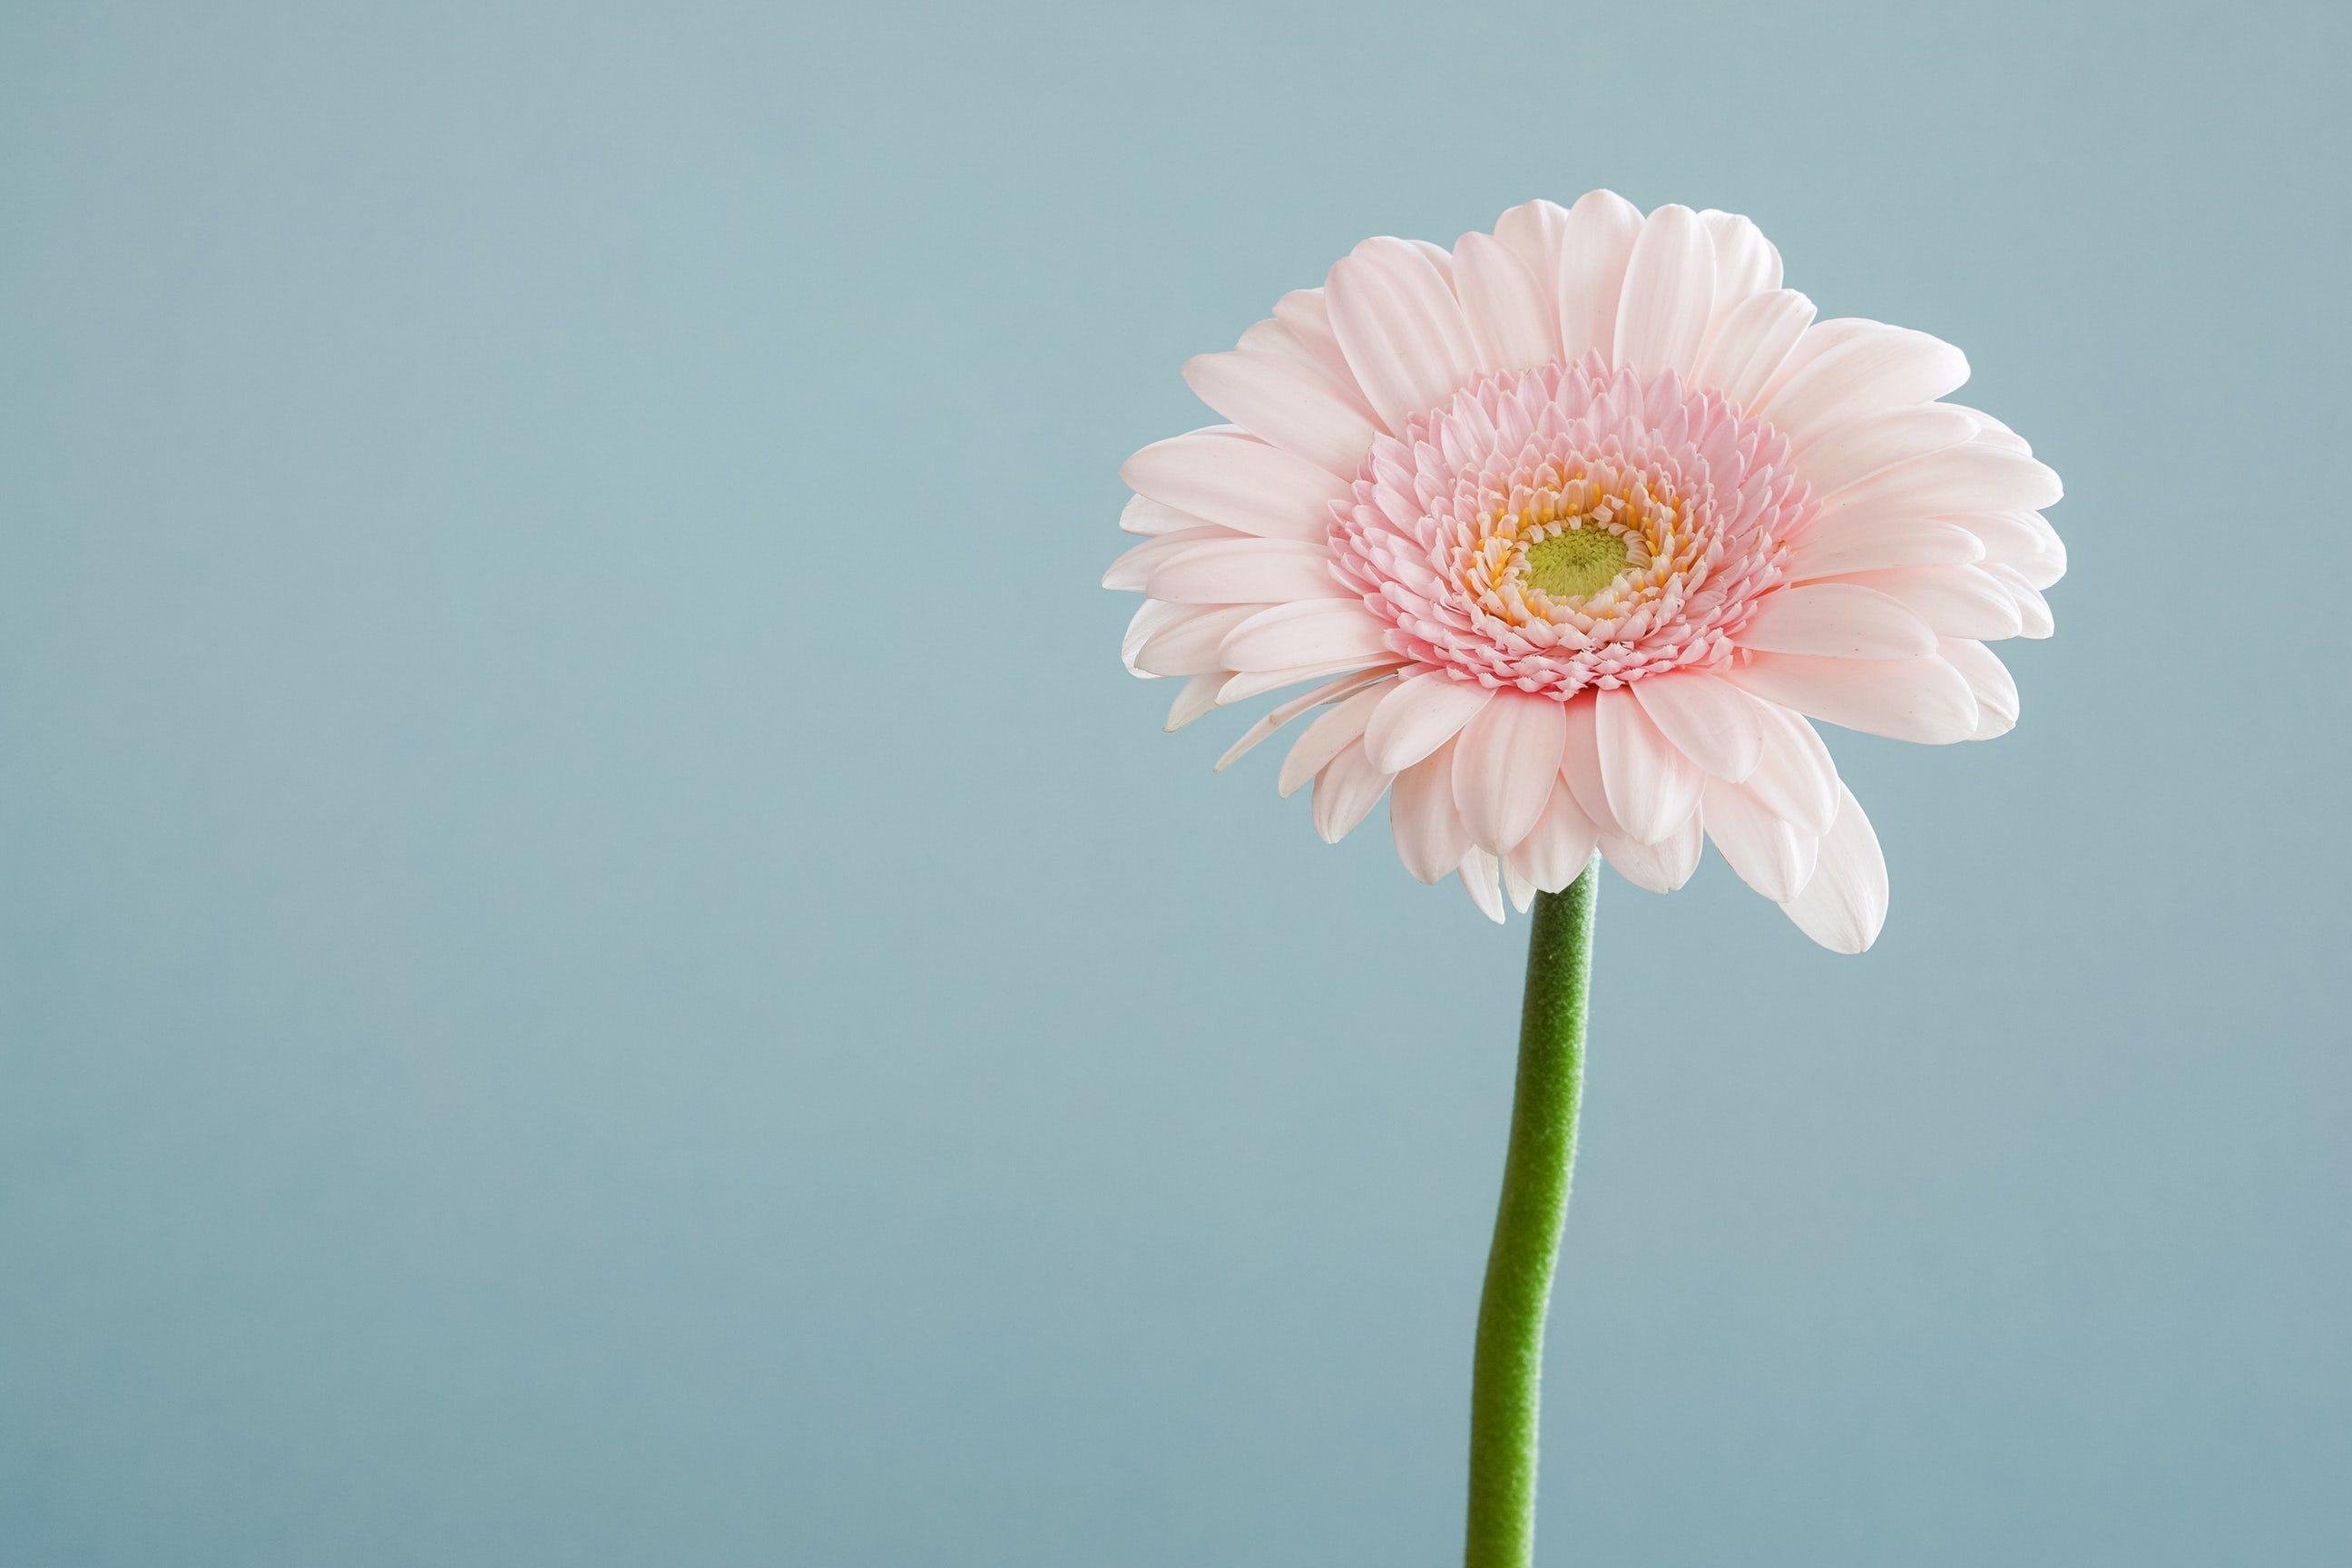 Close Up Of A Pastel Pink Gerbera Flower Flower Images Gerbera Flower Flower Seeds